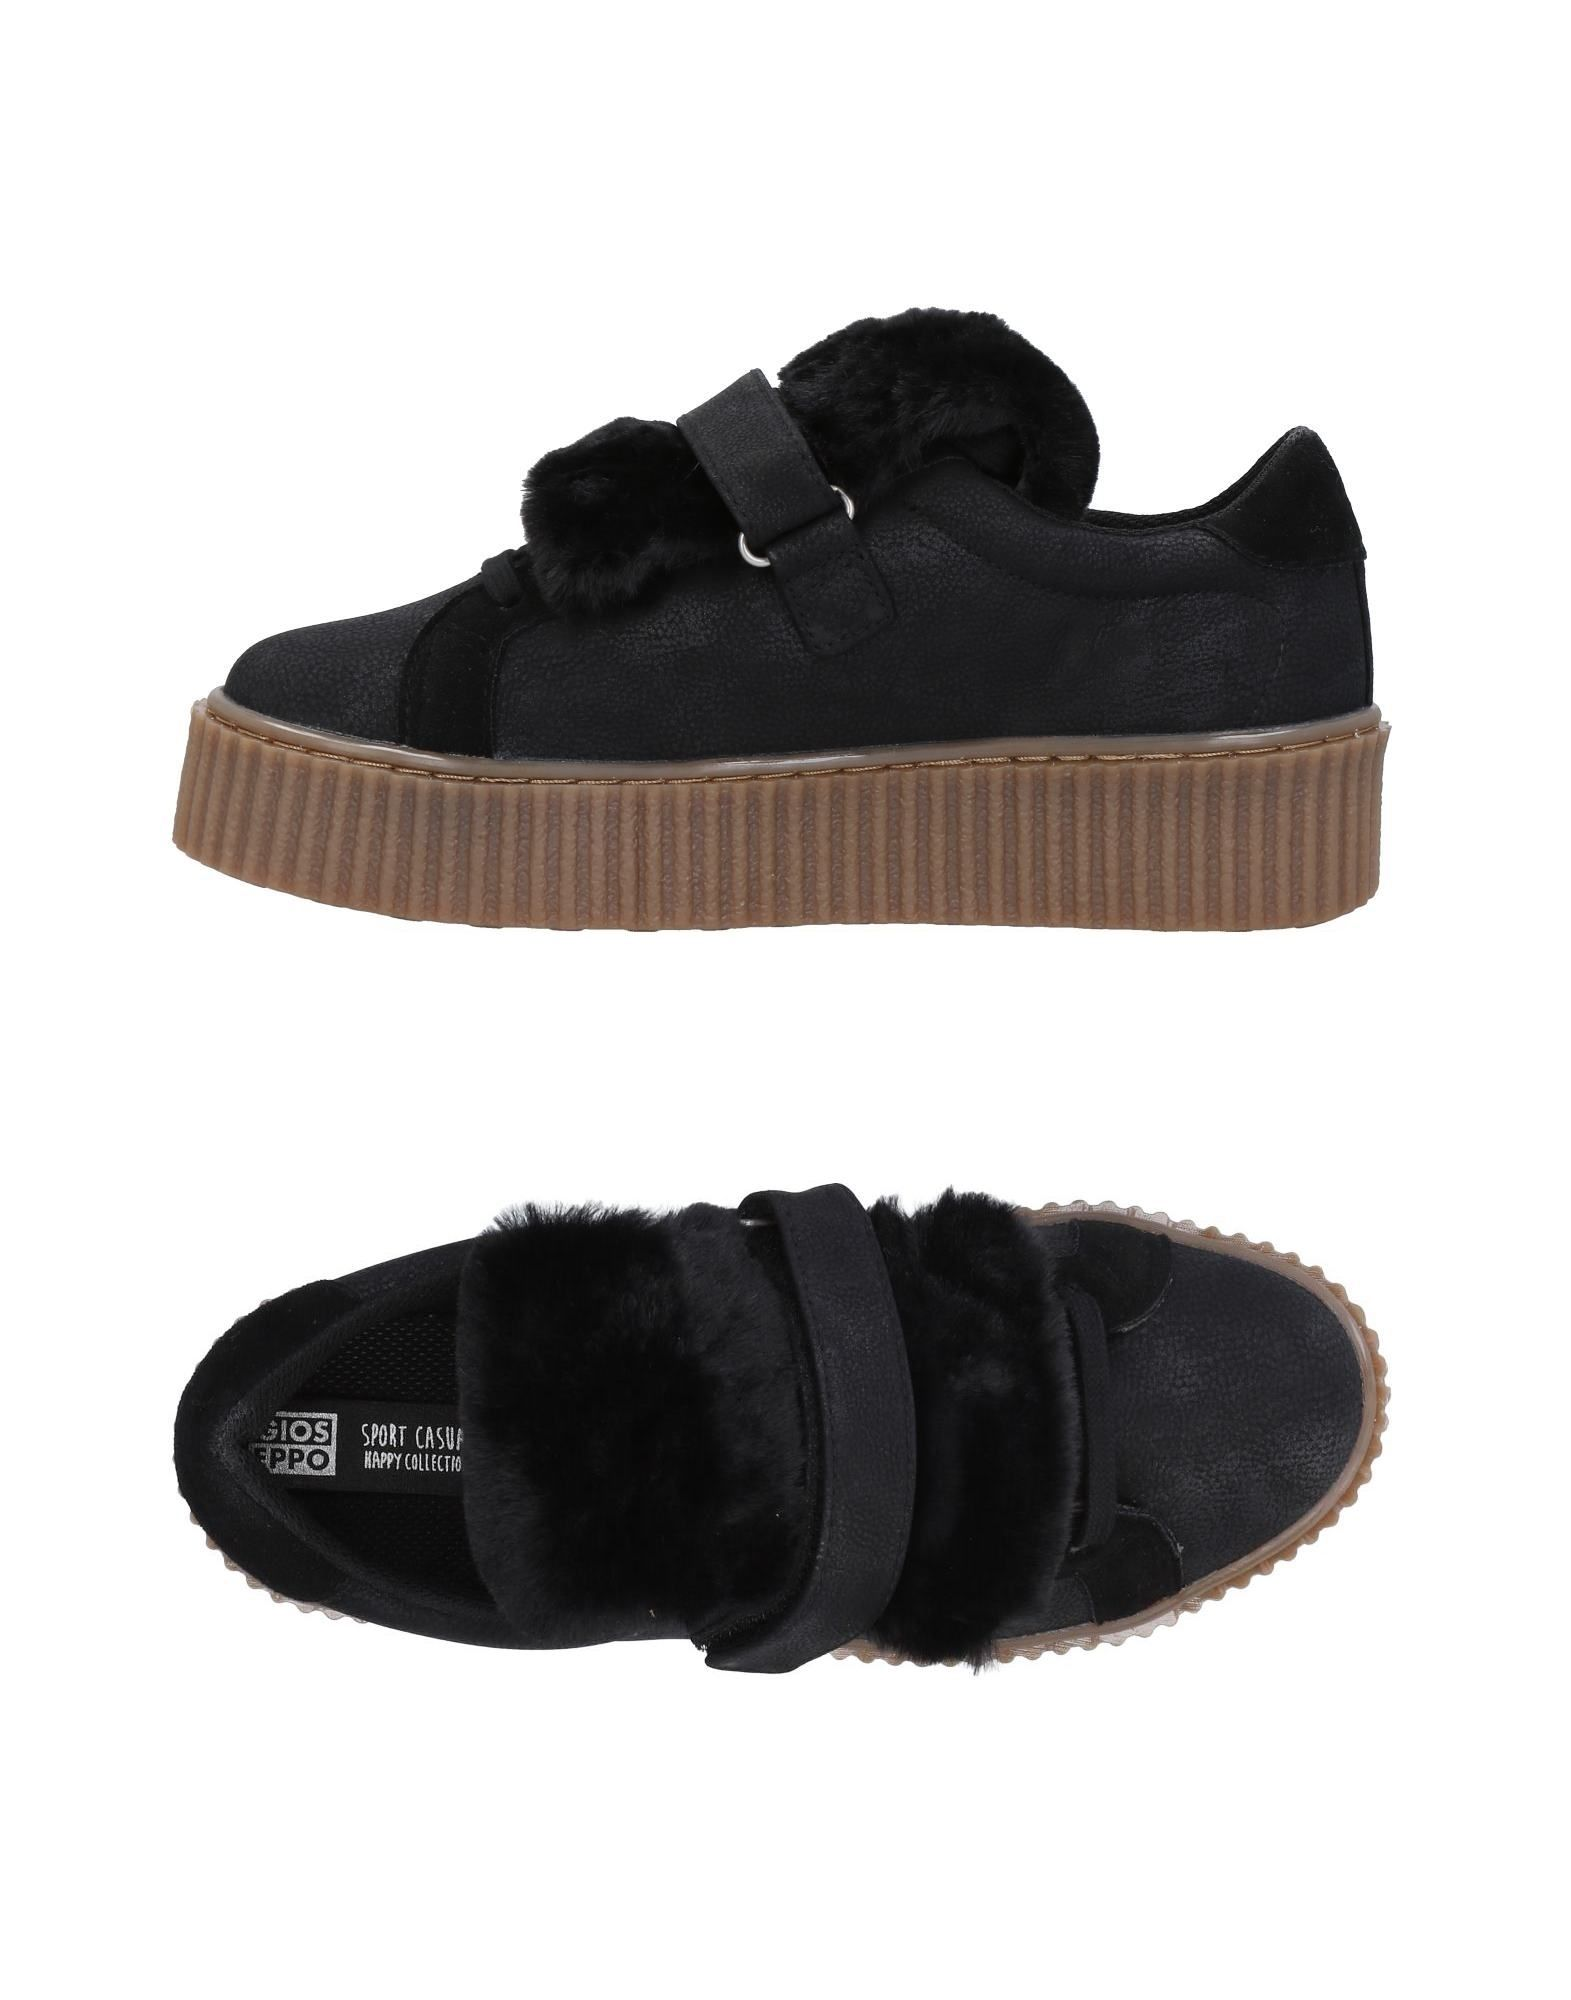 Sneakers Gioseppo Donna comode - 11460760TW Scarpe comode Donna e distintive 9bf054